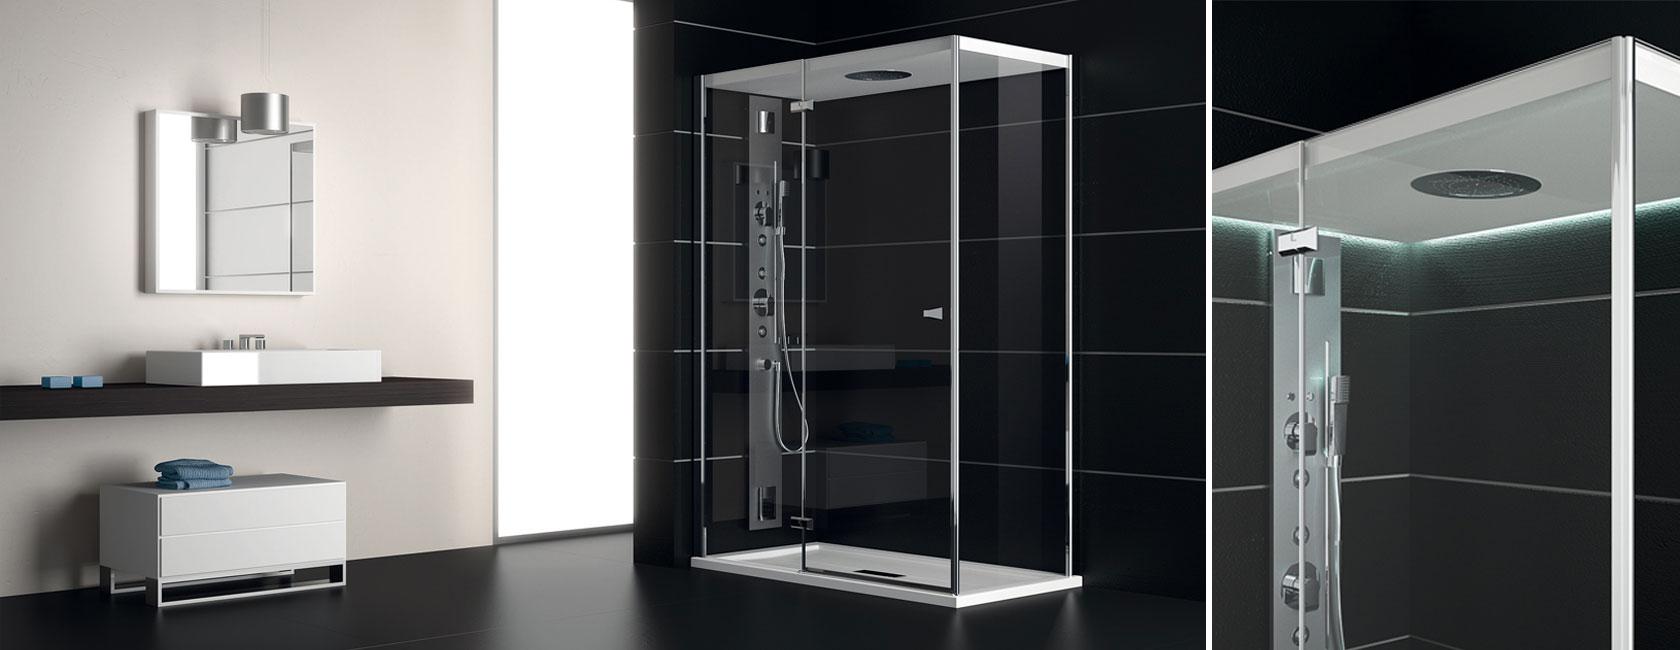 Box doccia vasca giaquinto for Arredo bagno vasca